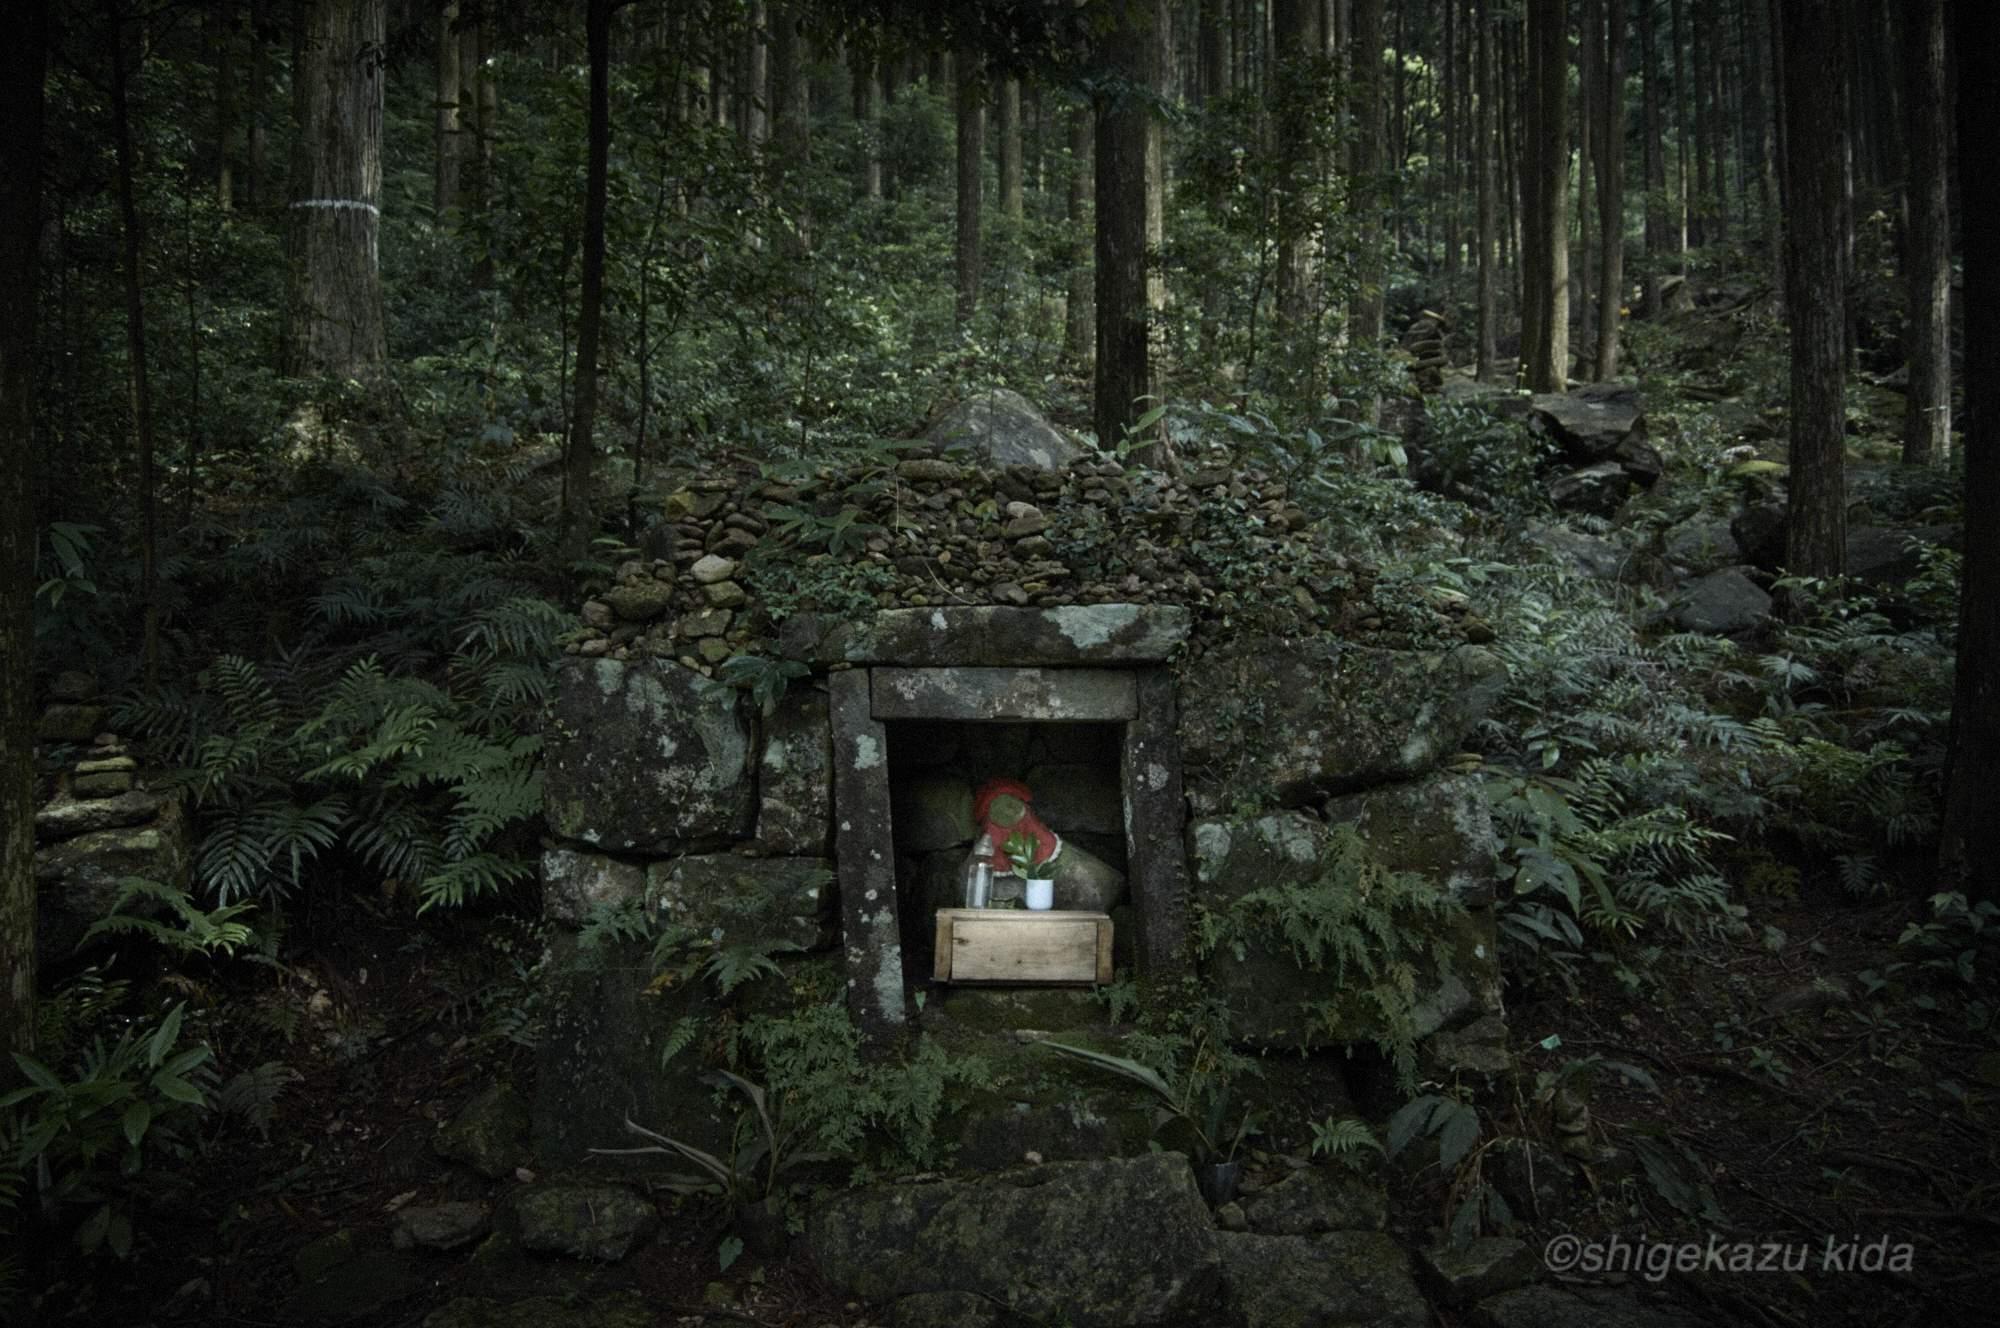 貴田茂和 shigekazu kida 熊野古道の馬越峠